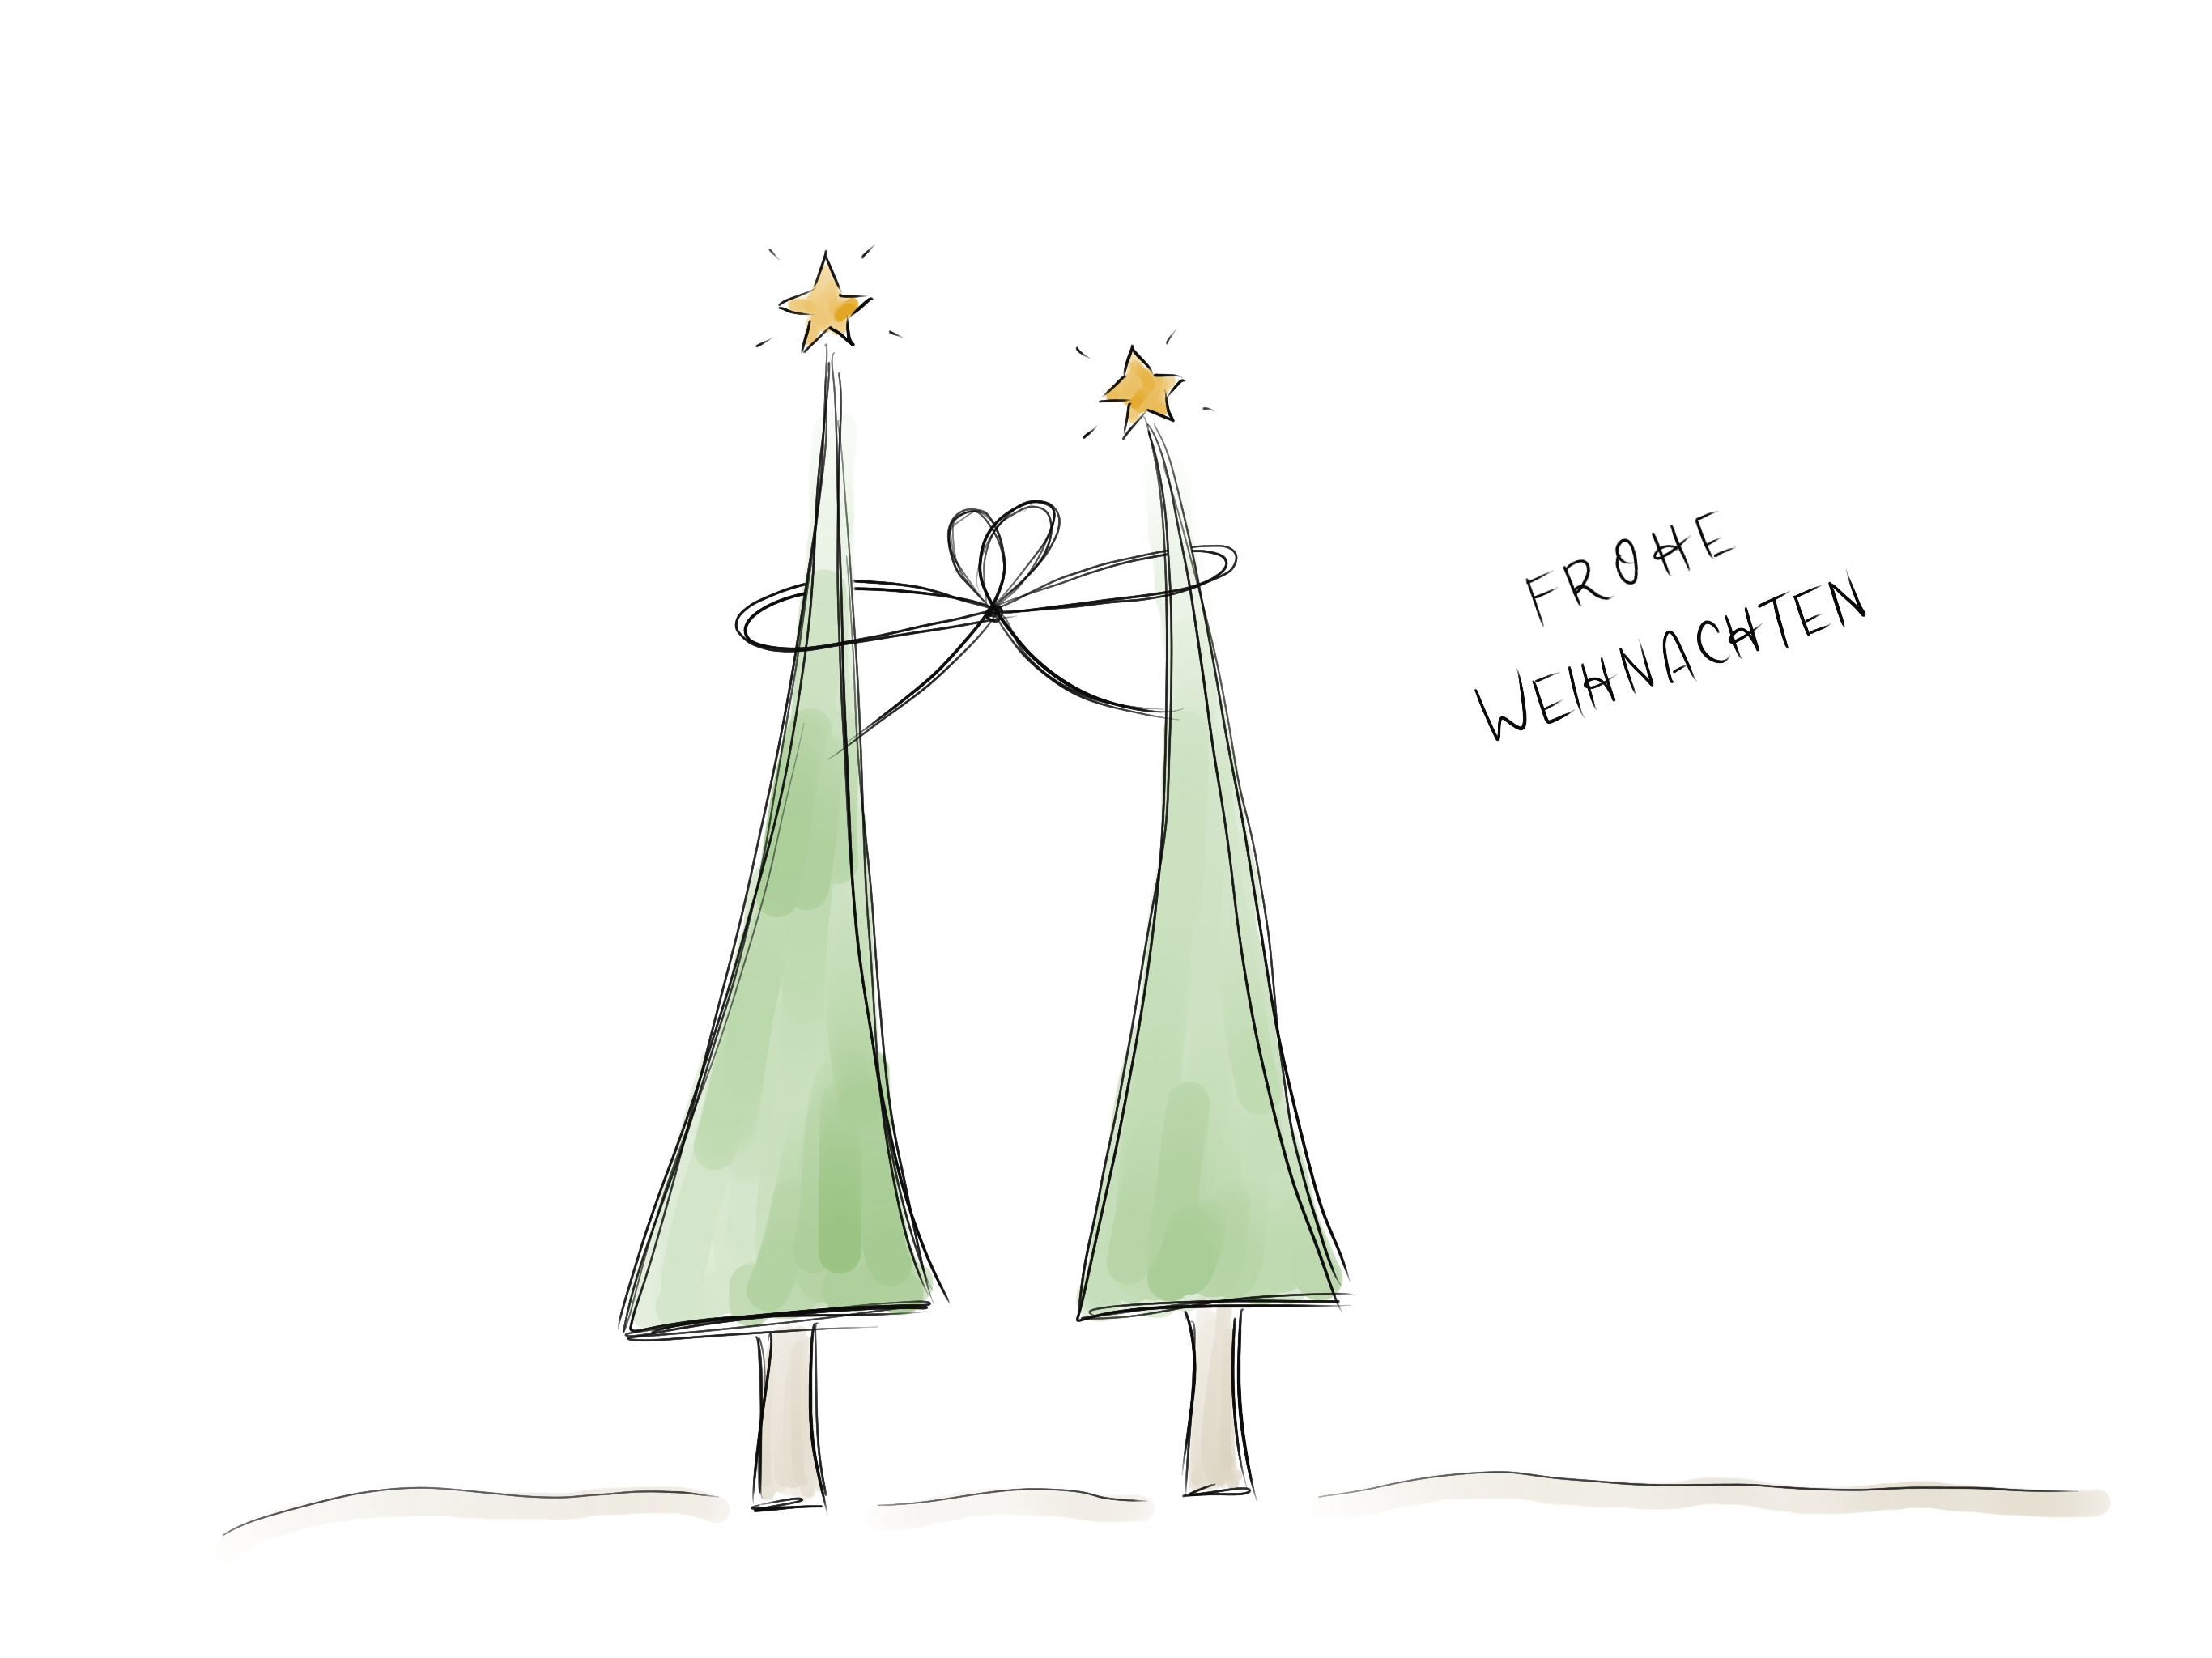 Weihnachtsbäume_1.png